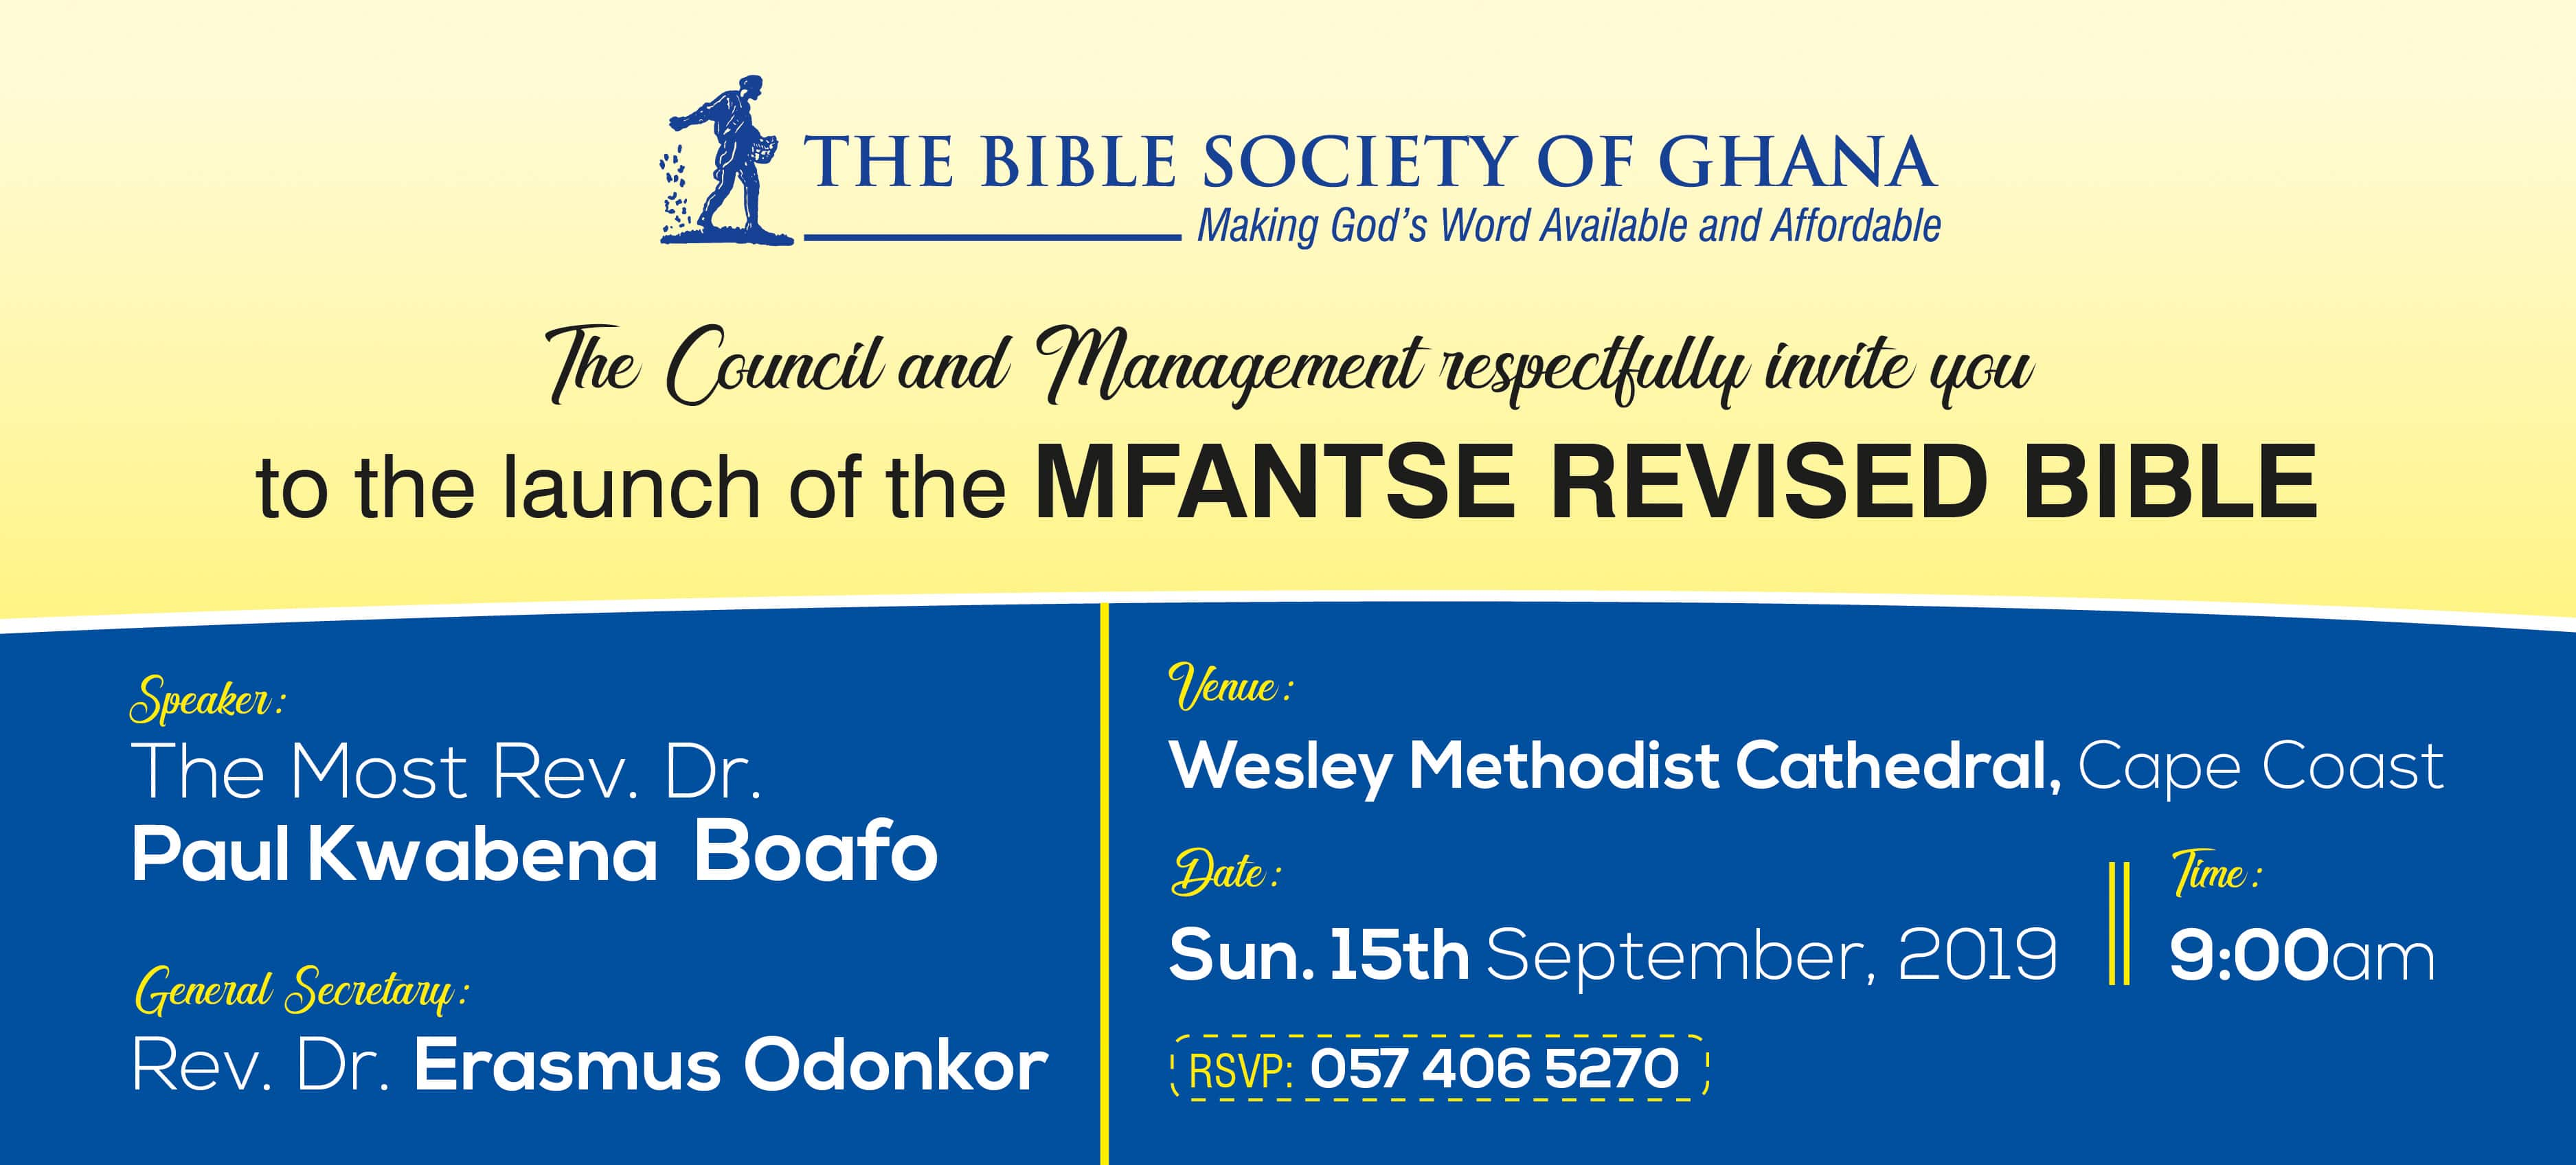 Bible Society Of Ghana |